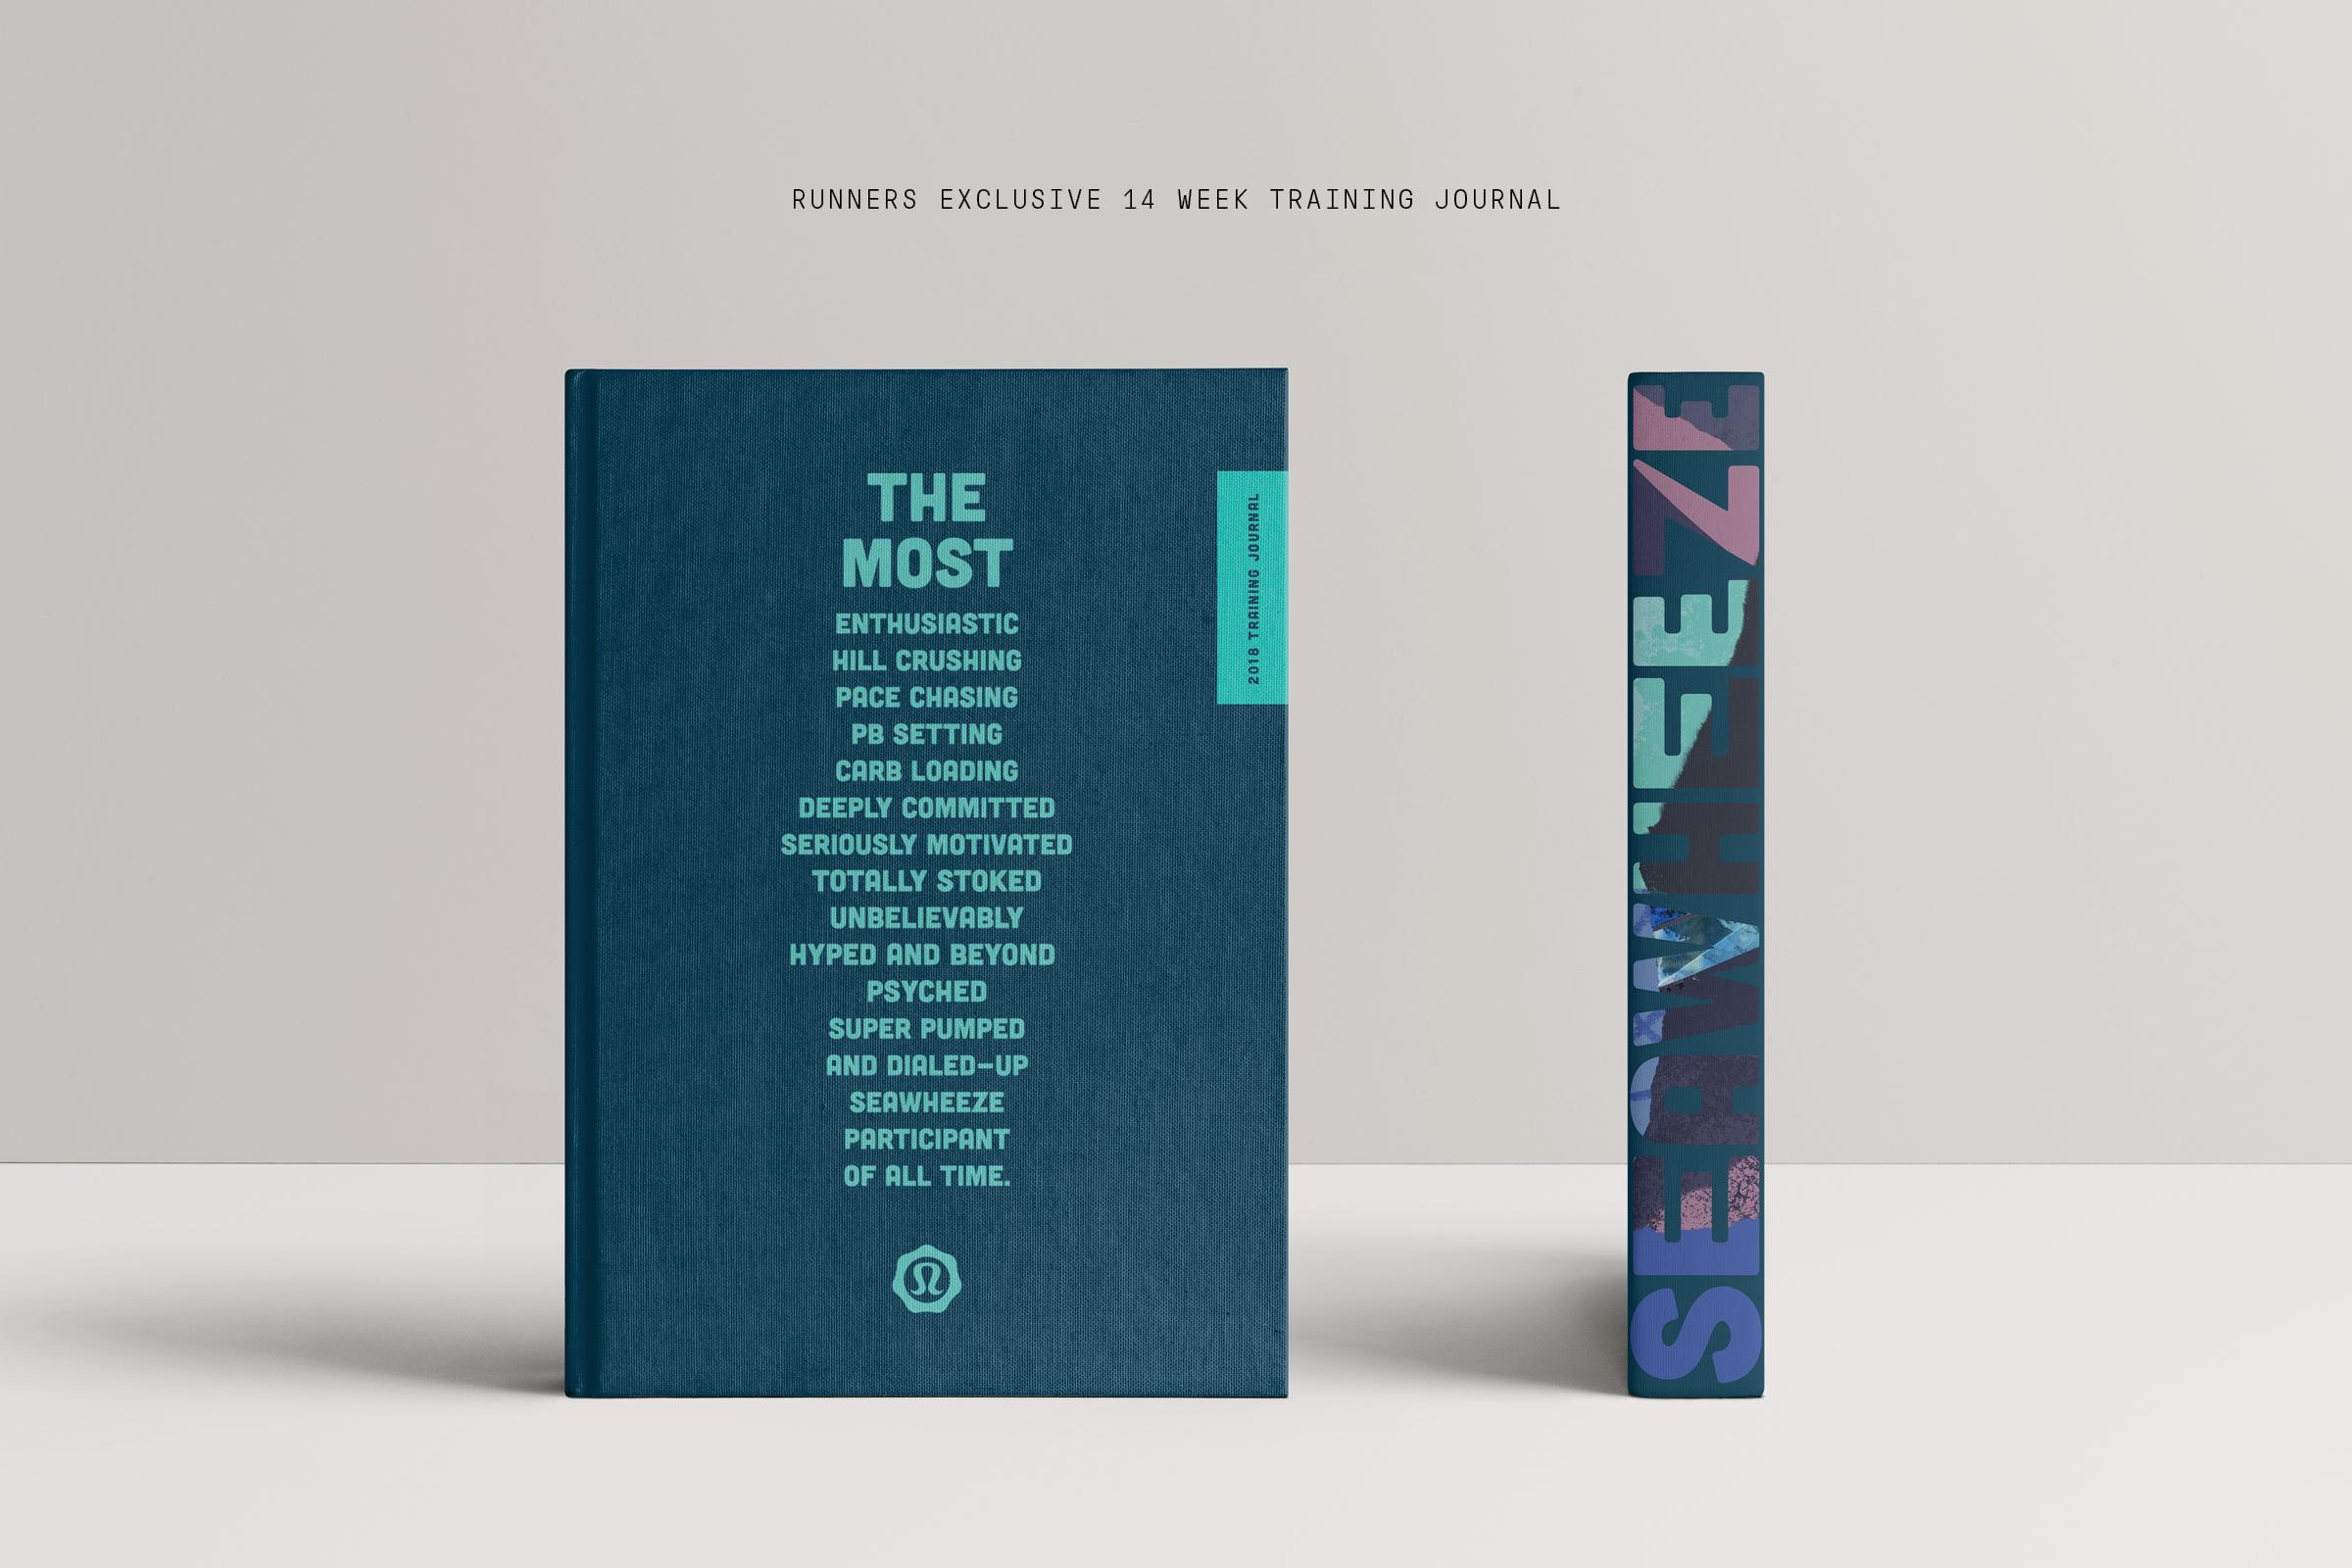 lululemon SeaWheeze 2018 Half Marathon Branding – Collateral book design with inspiring brand message.